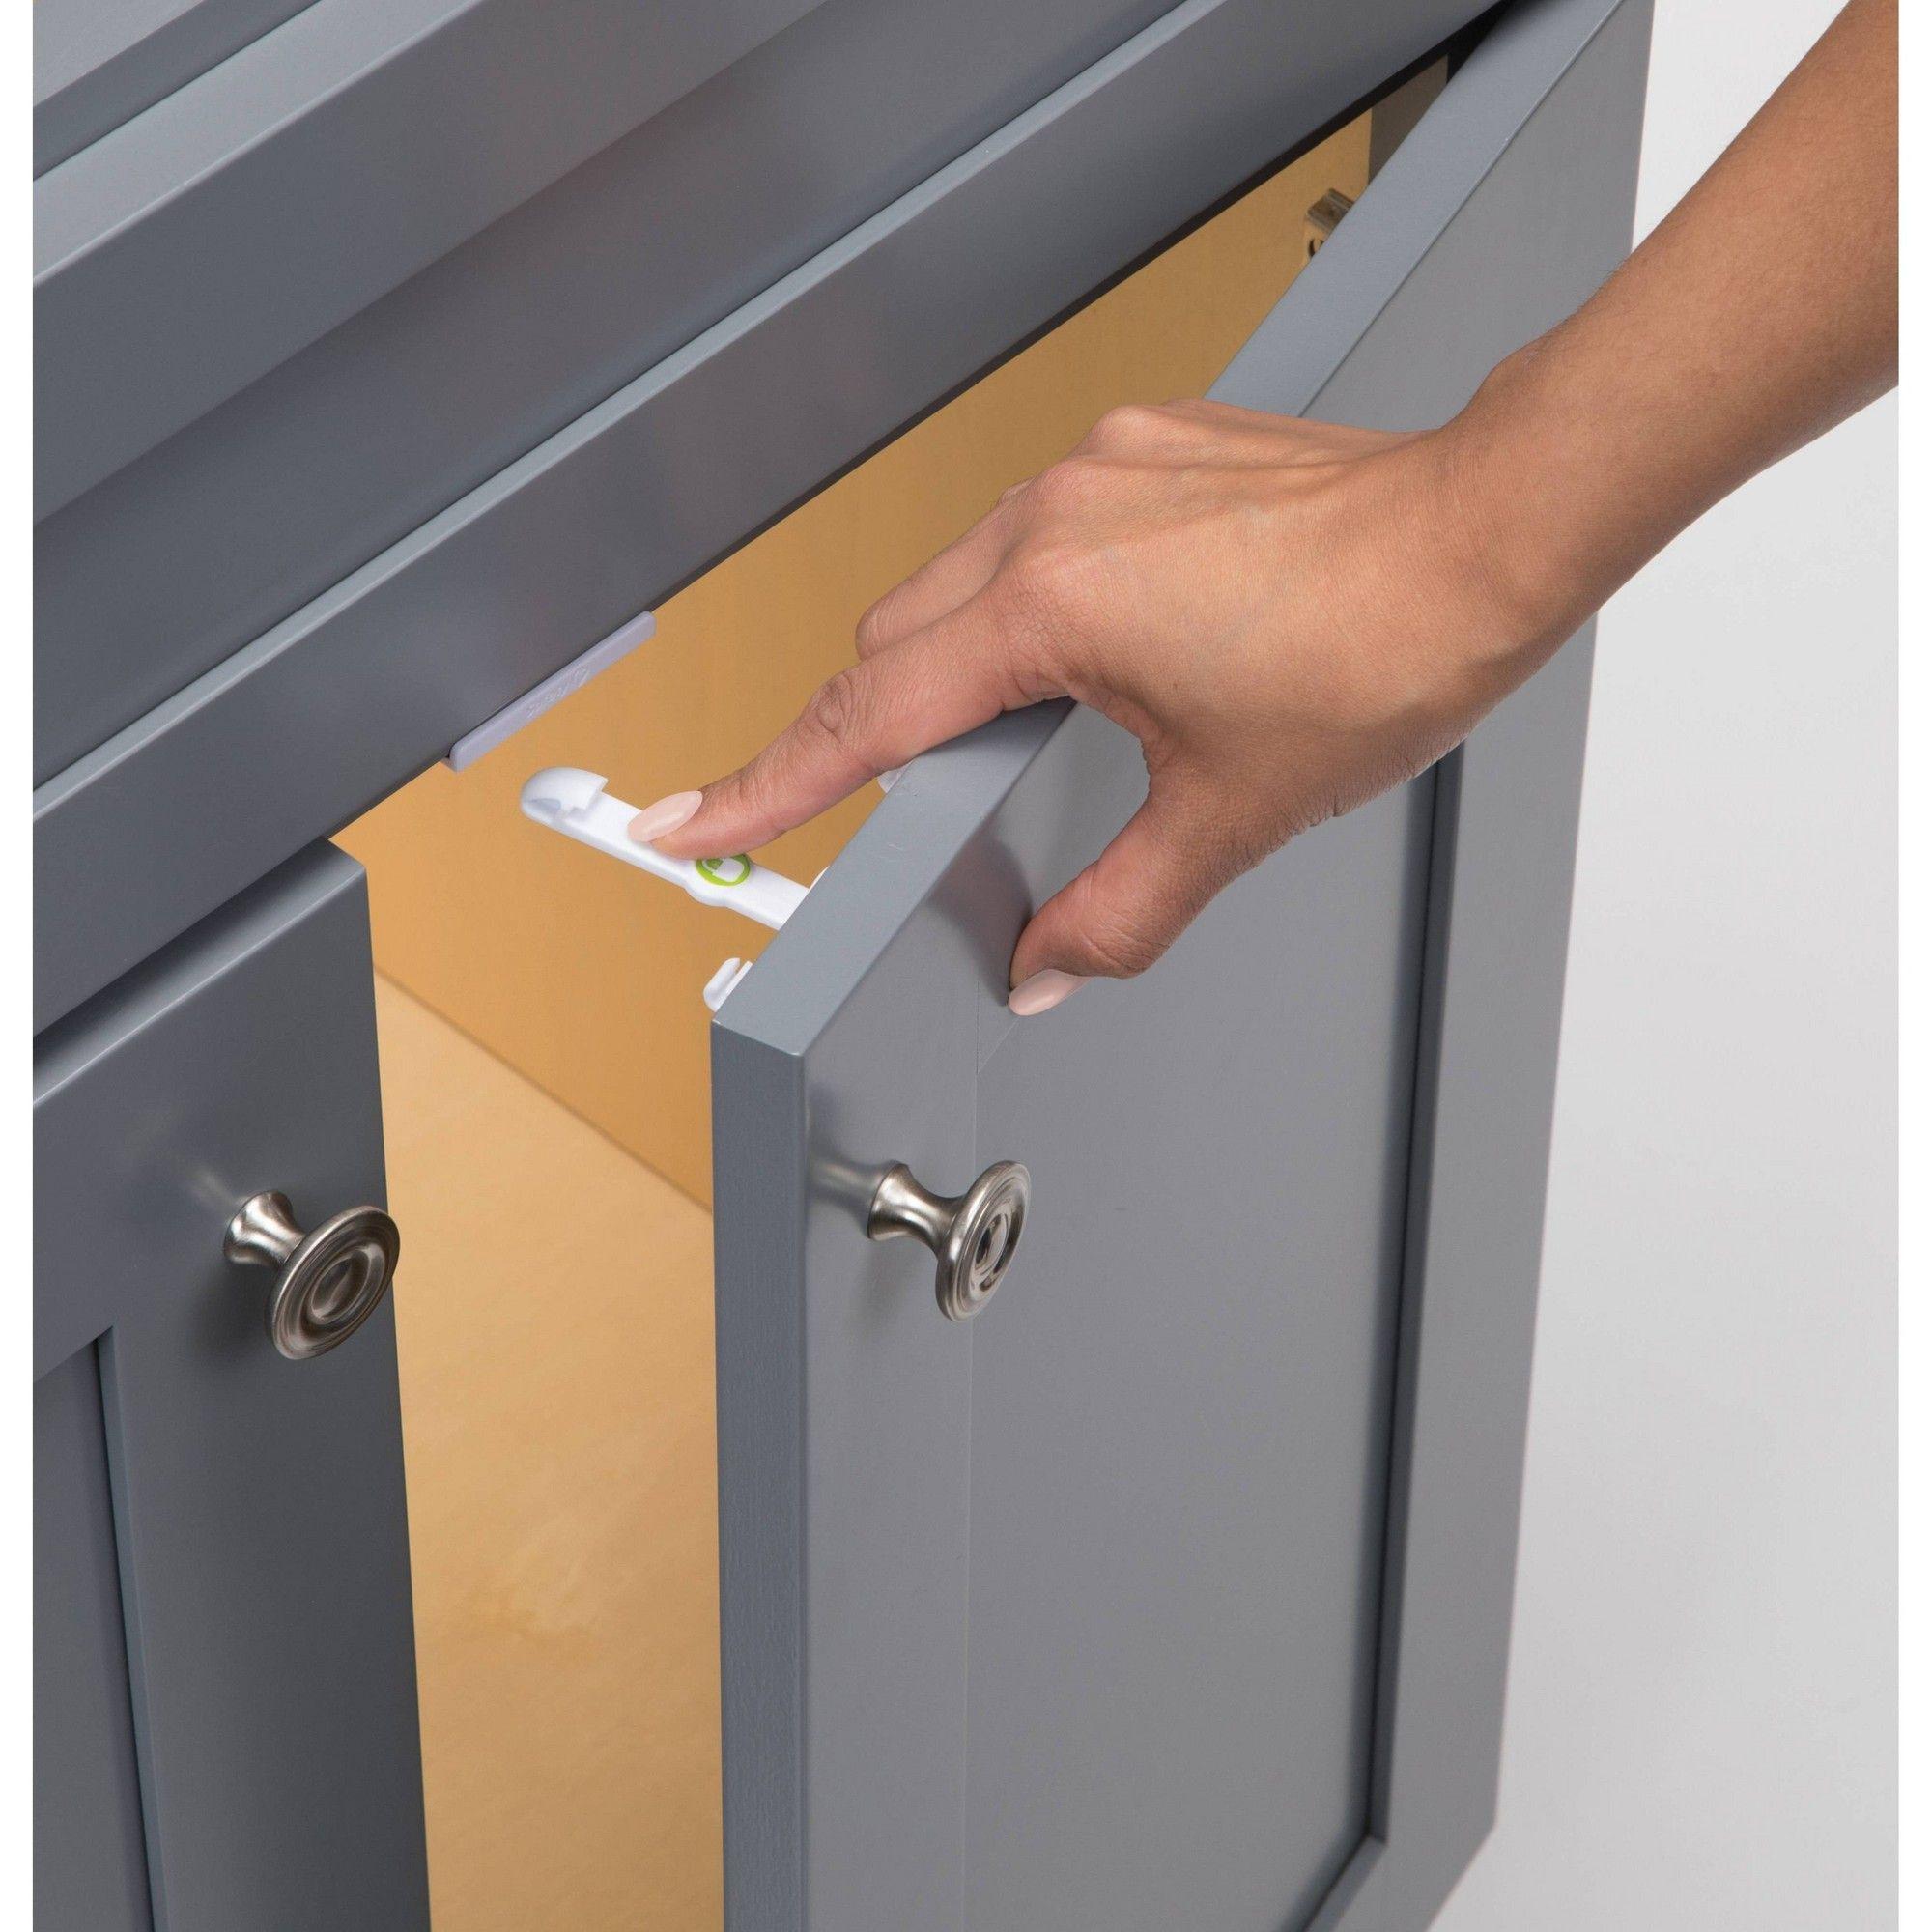 Safety 1st Adhesive Latch 8pk, White latch